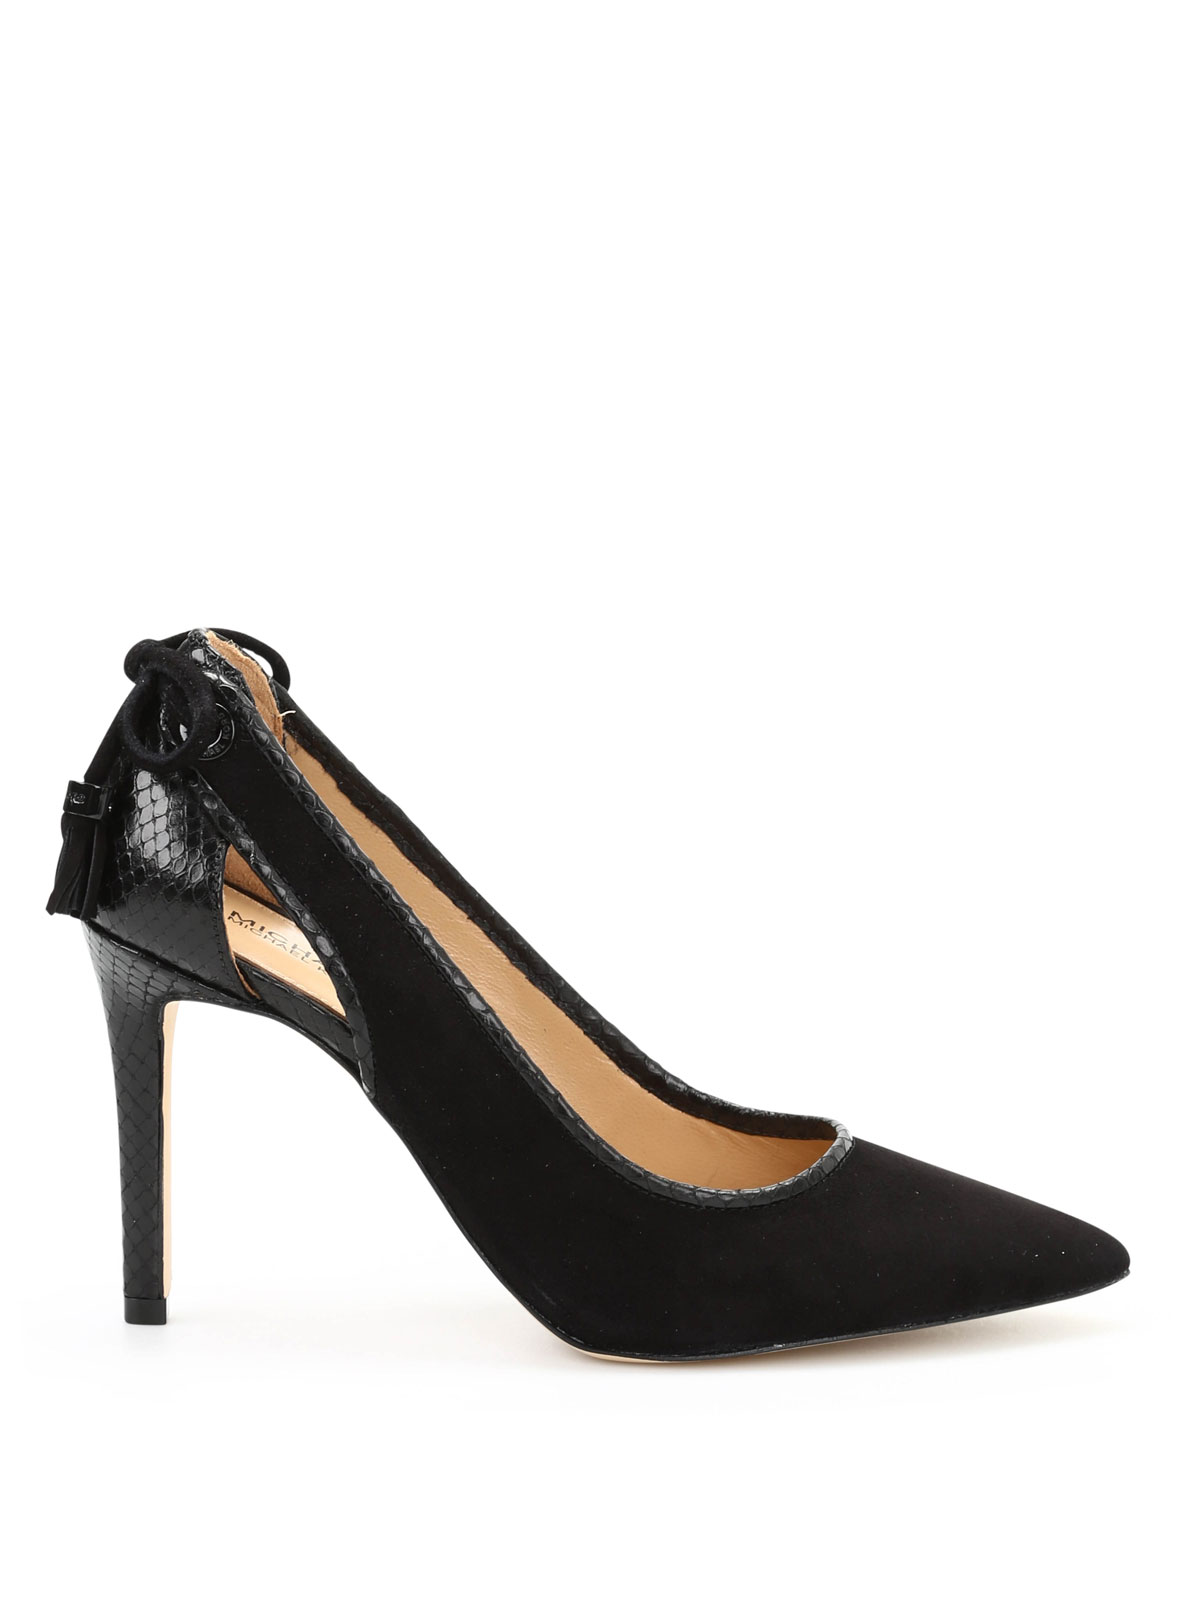 jennings pumps by michael kors court shoes ikrix. Black Bedroom Furniture Sets. Home Design Ideas